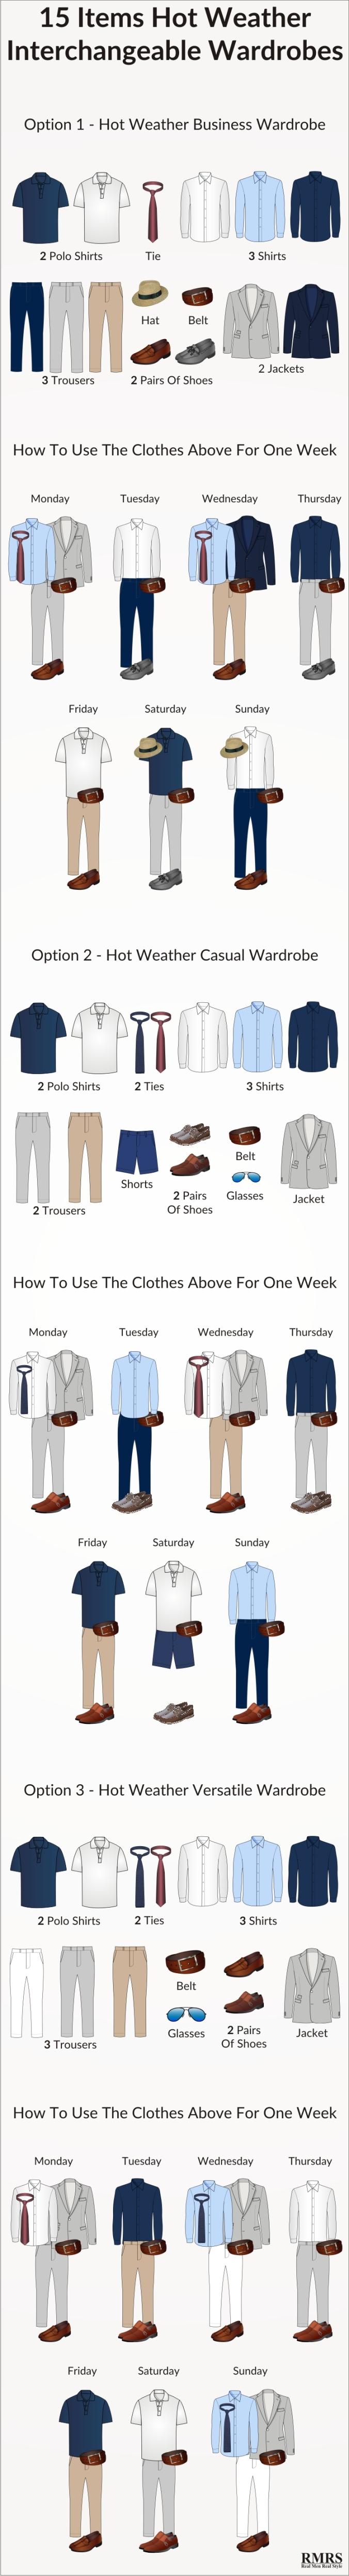 summer-heat-interchangeable-business-casual-versatile-wardrobe-infographic